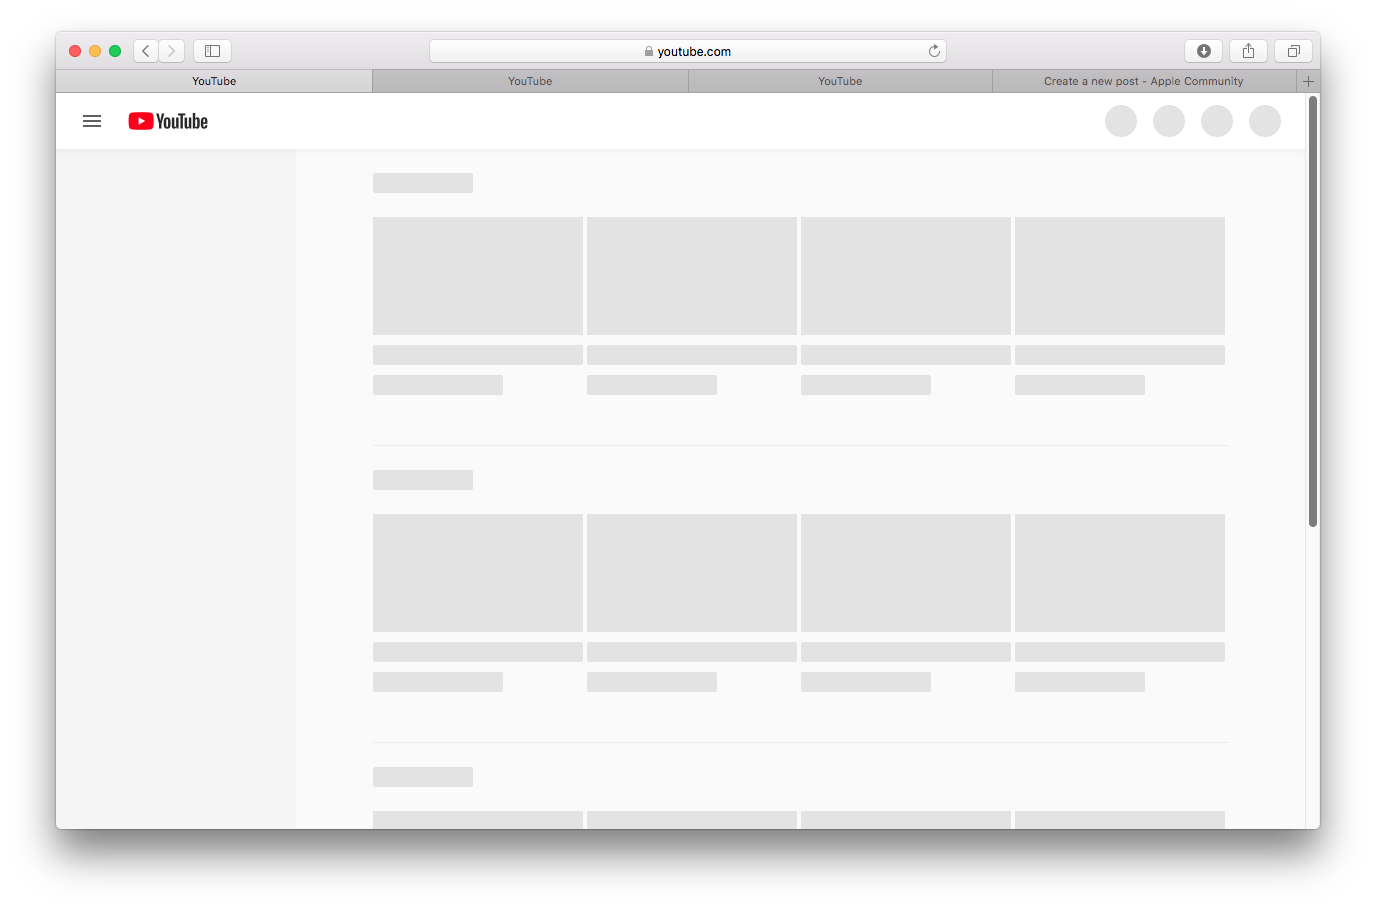 Youtube Not Working Properly On Safari Bu… - Apple Community